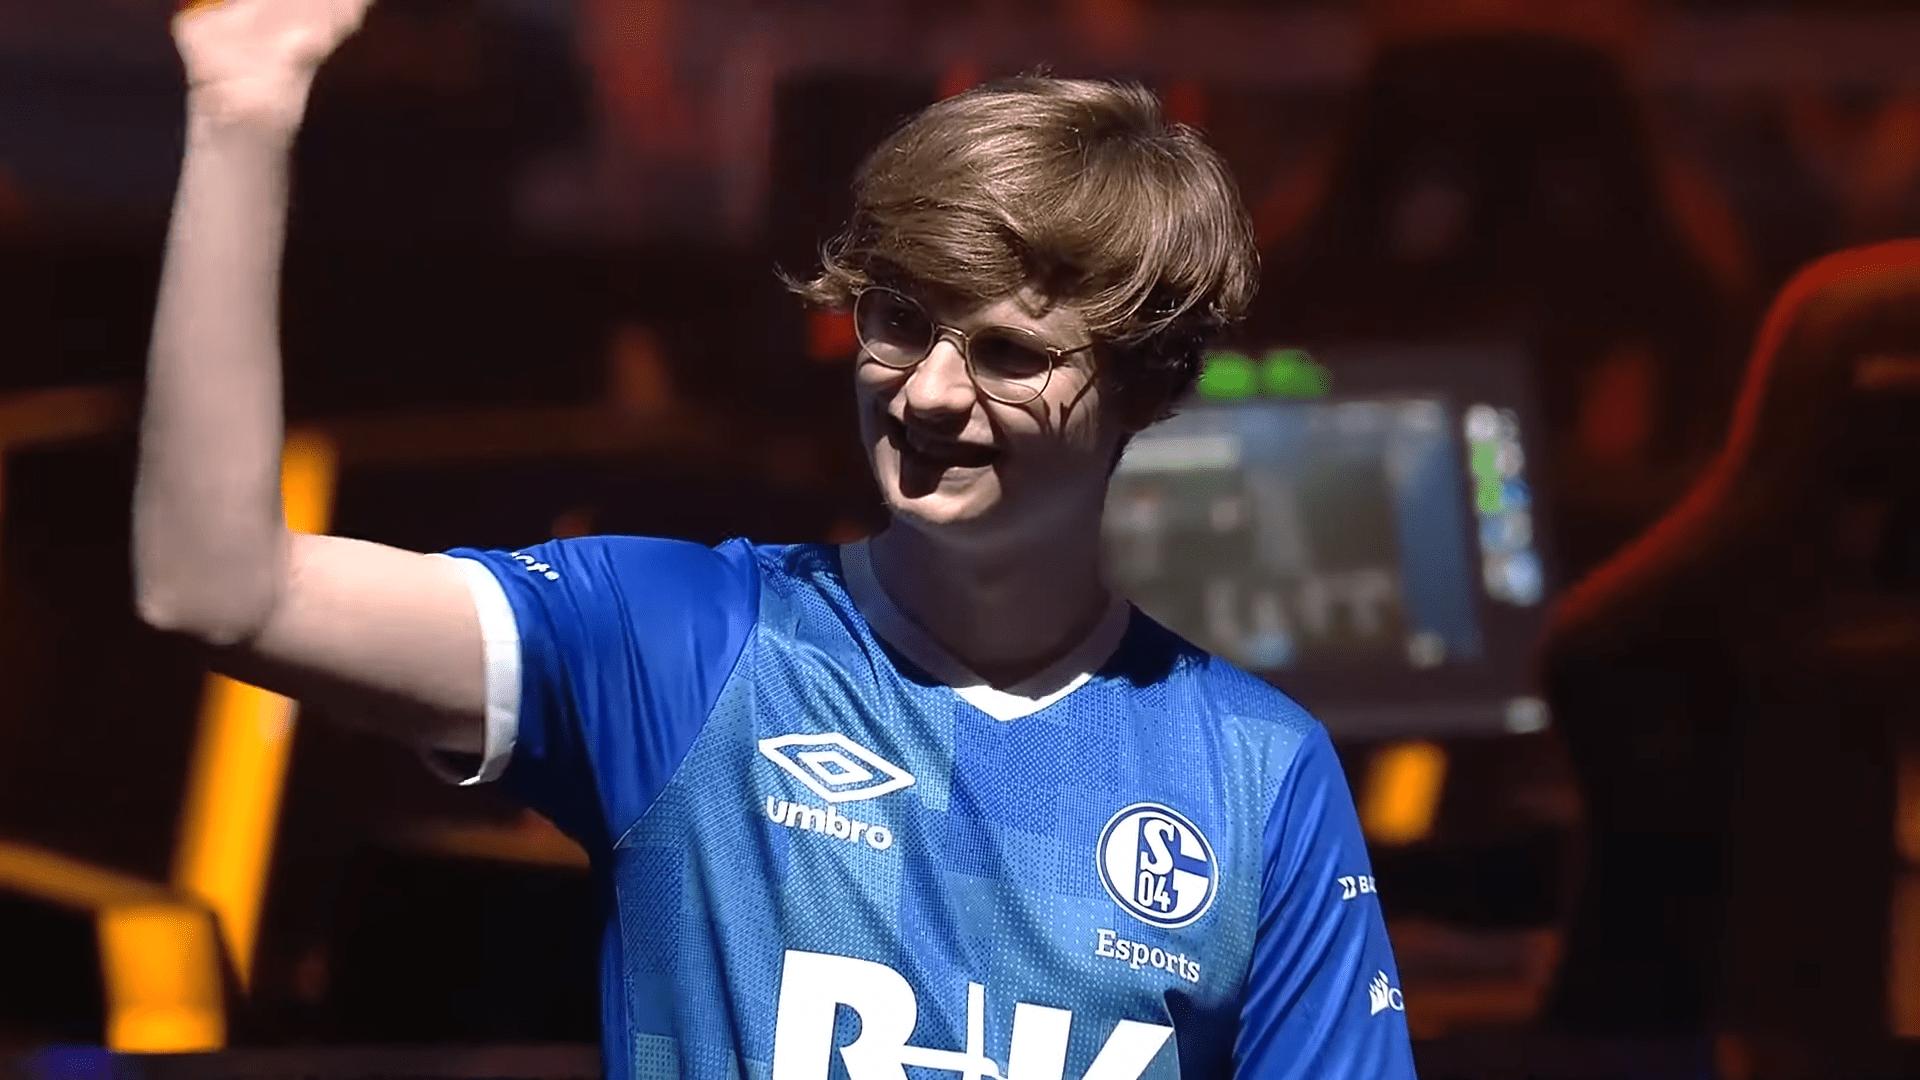 League Of Legends Team Schalke 04 Parts Ways With ADC Player, Elias 'Upset' Lipp